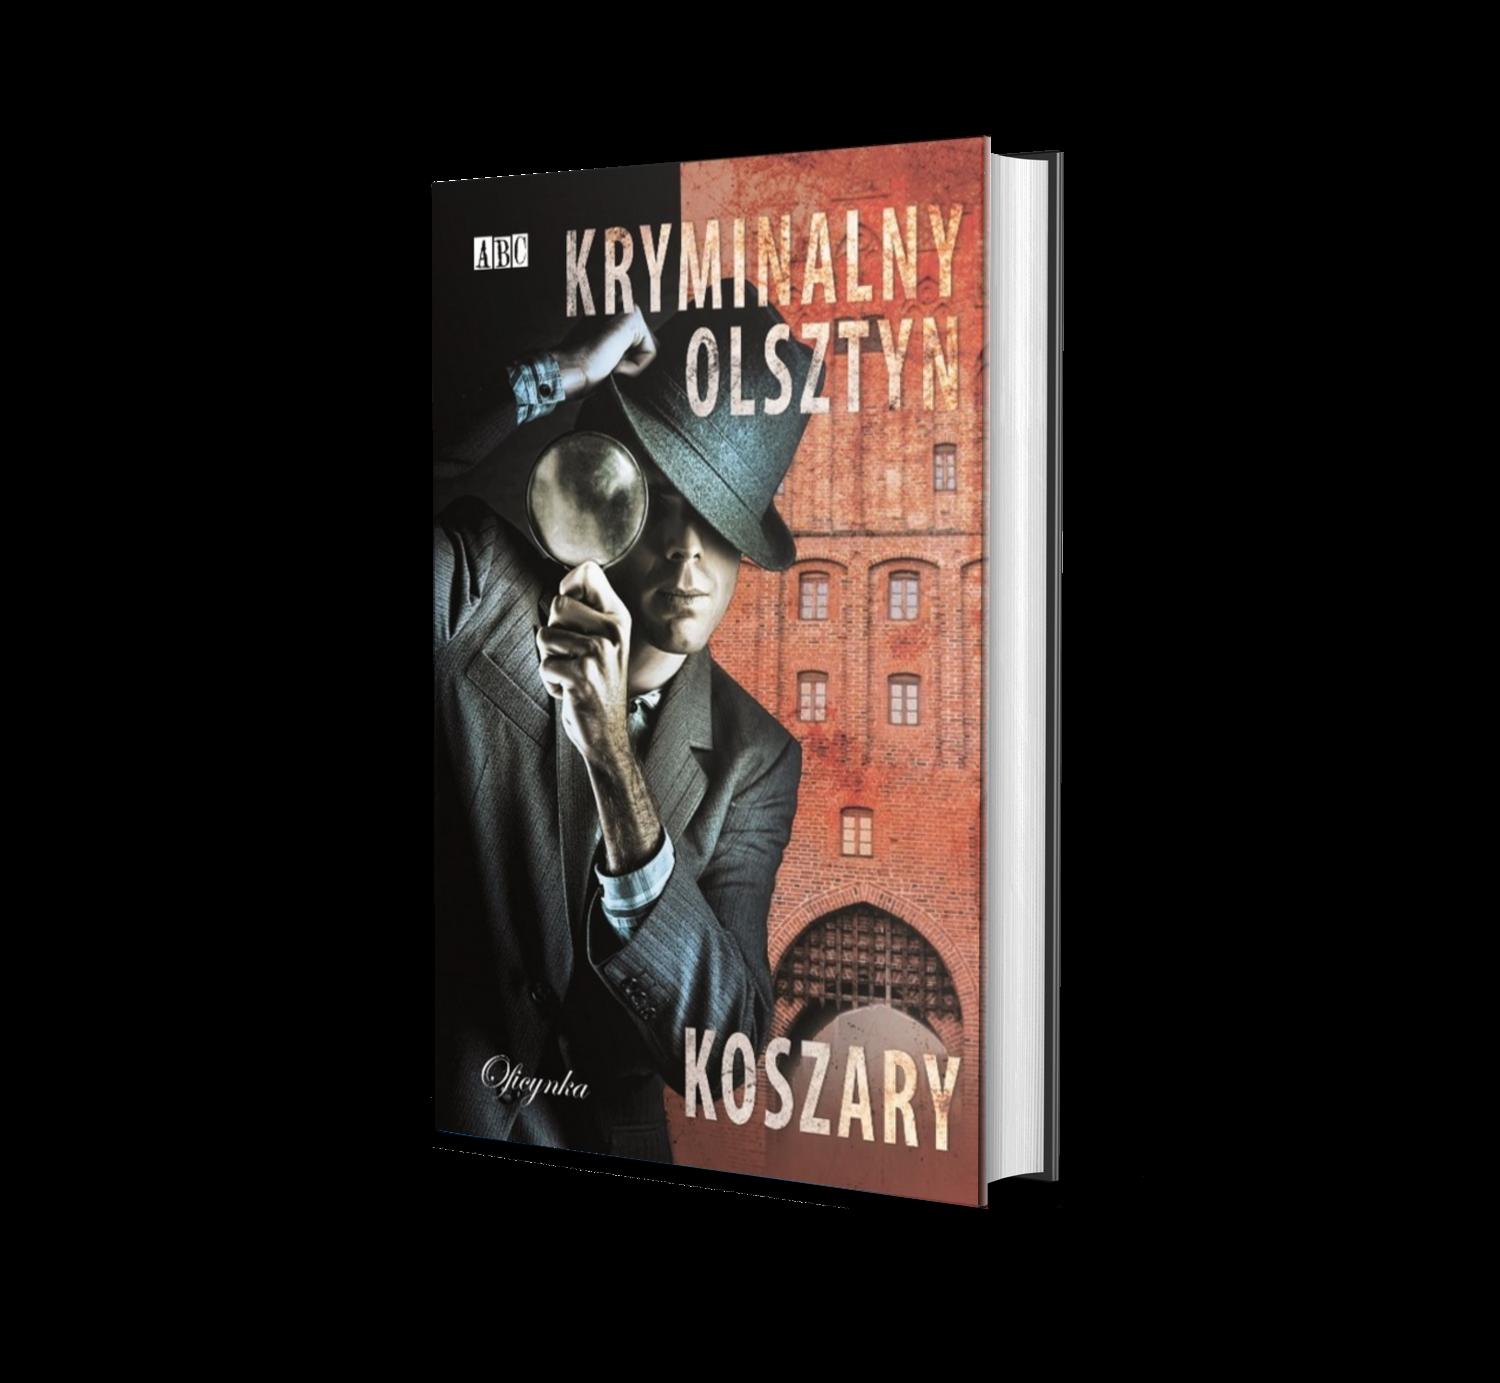 Kryminalny Olszytn - Koszary